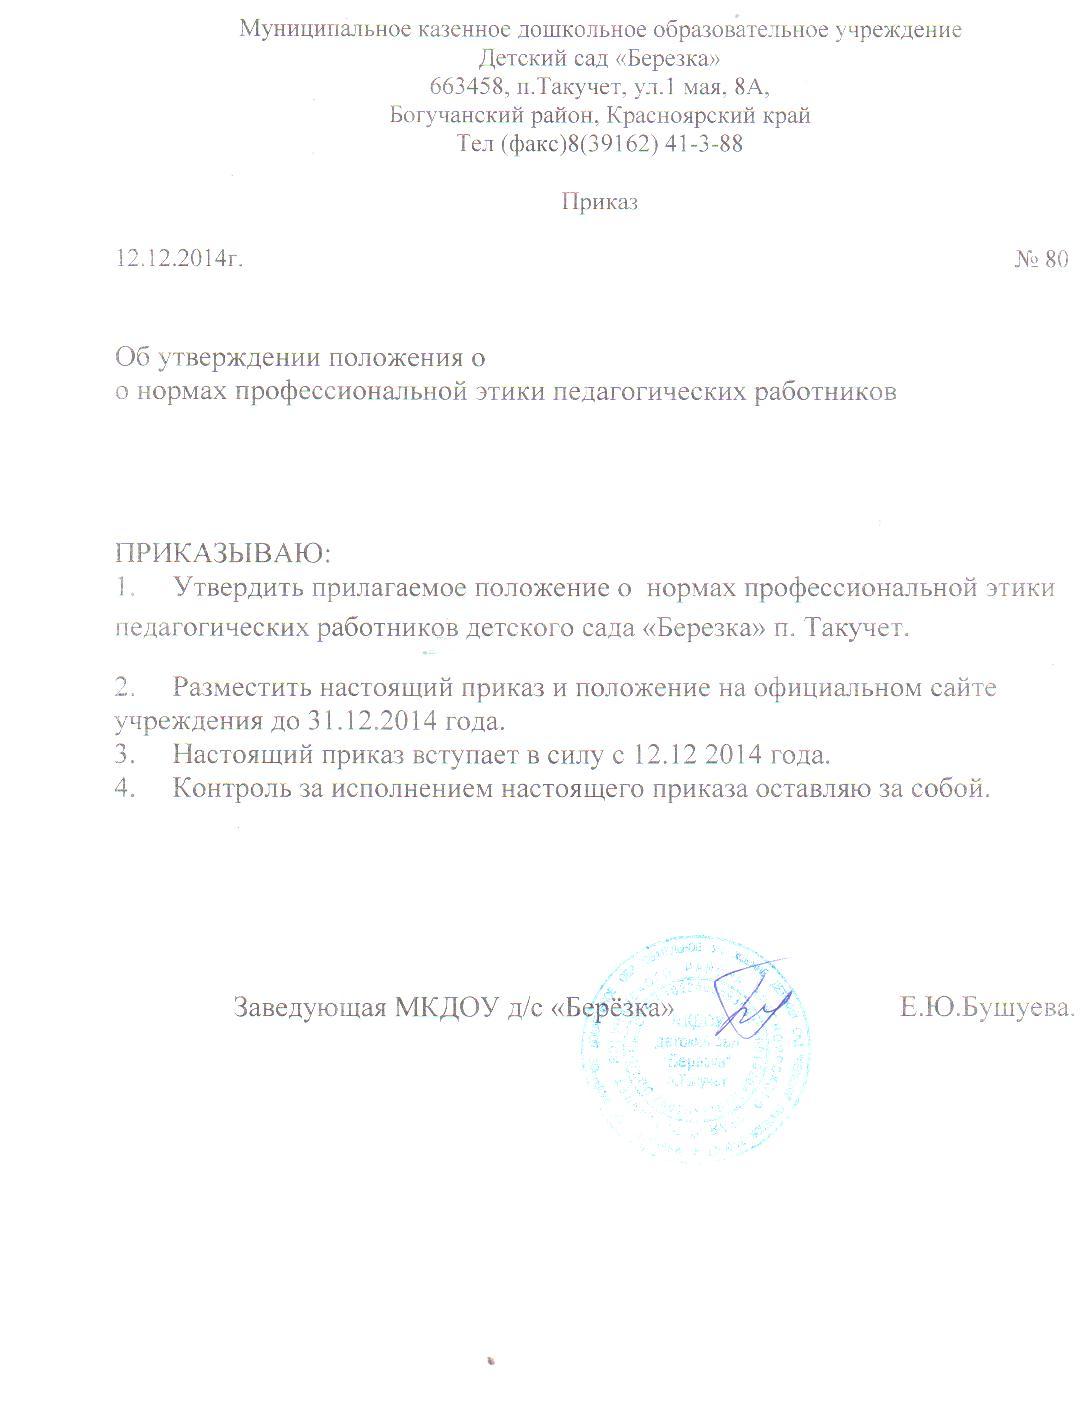 Приказ О нормах проф. этики